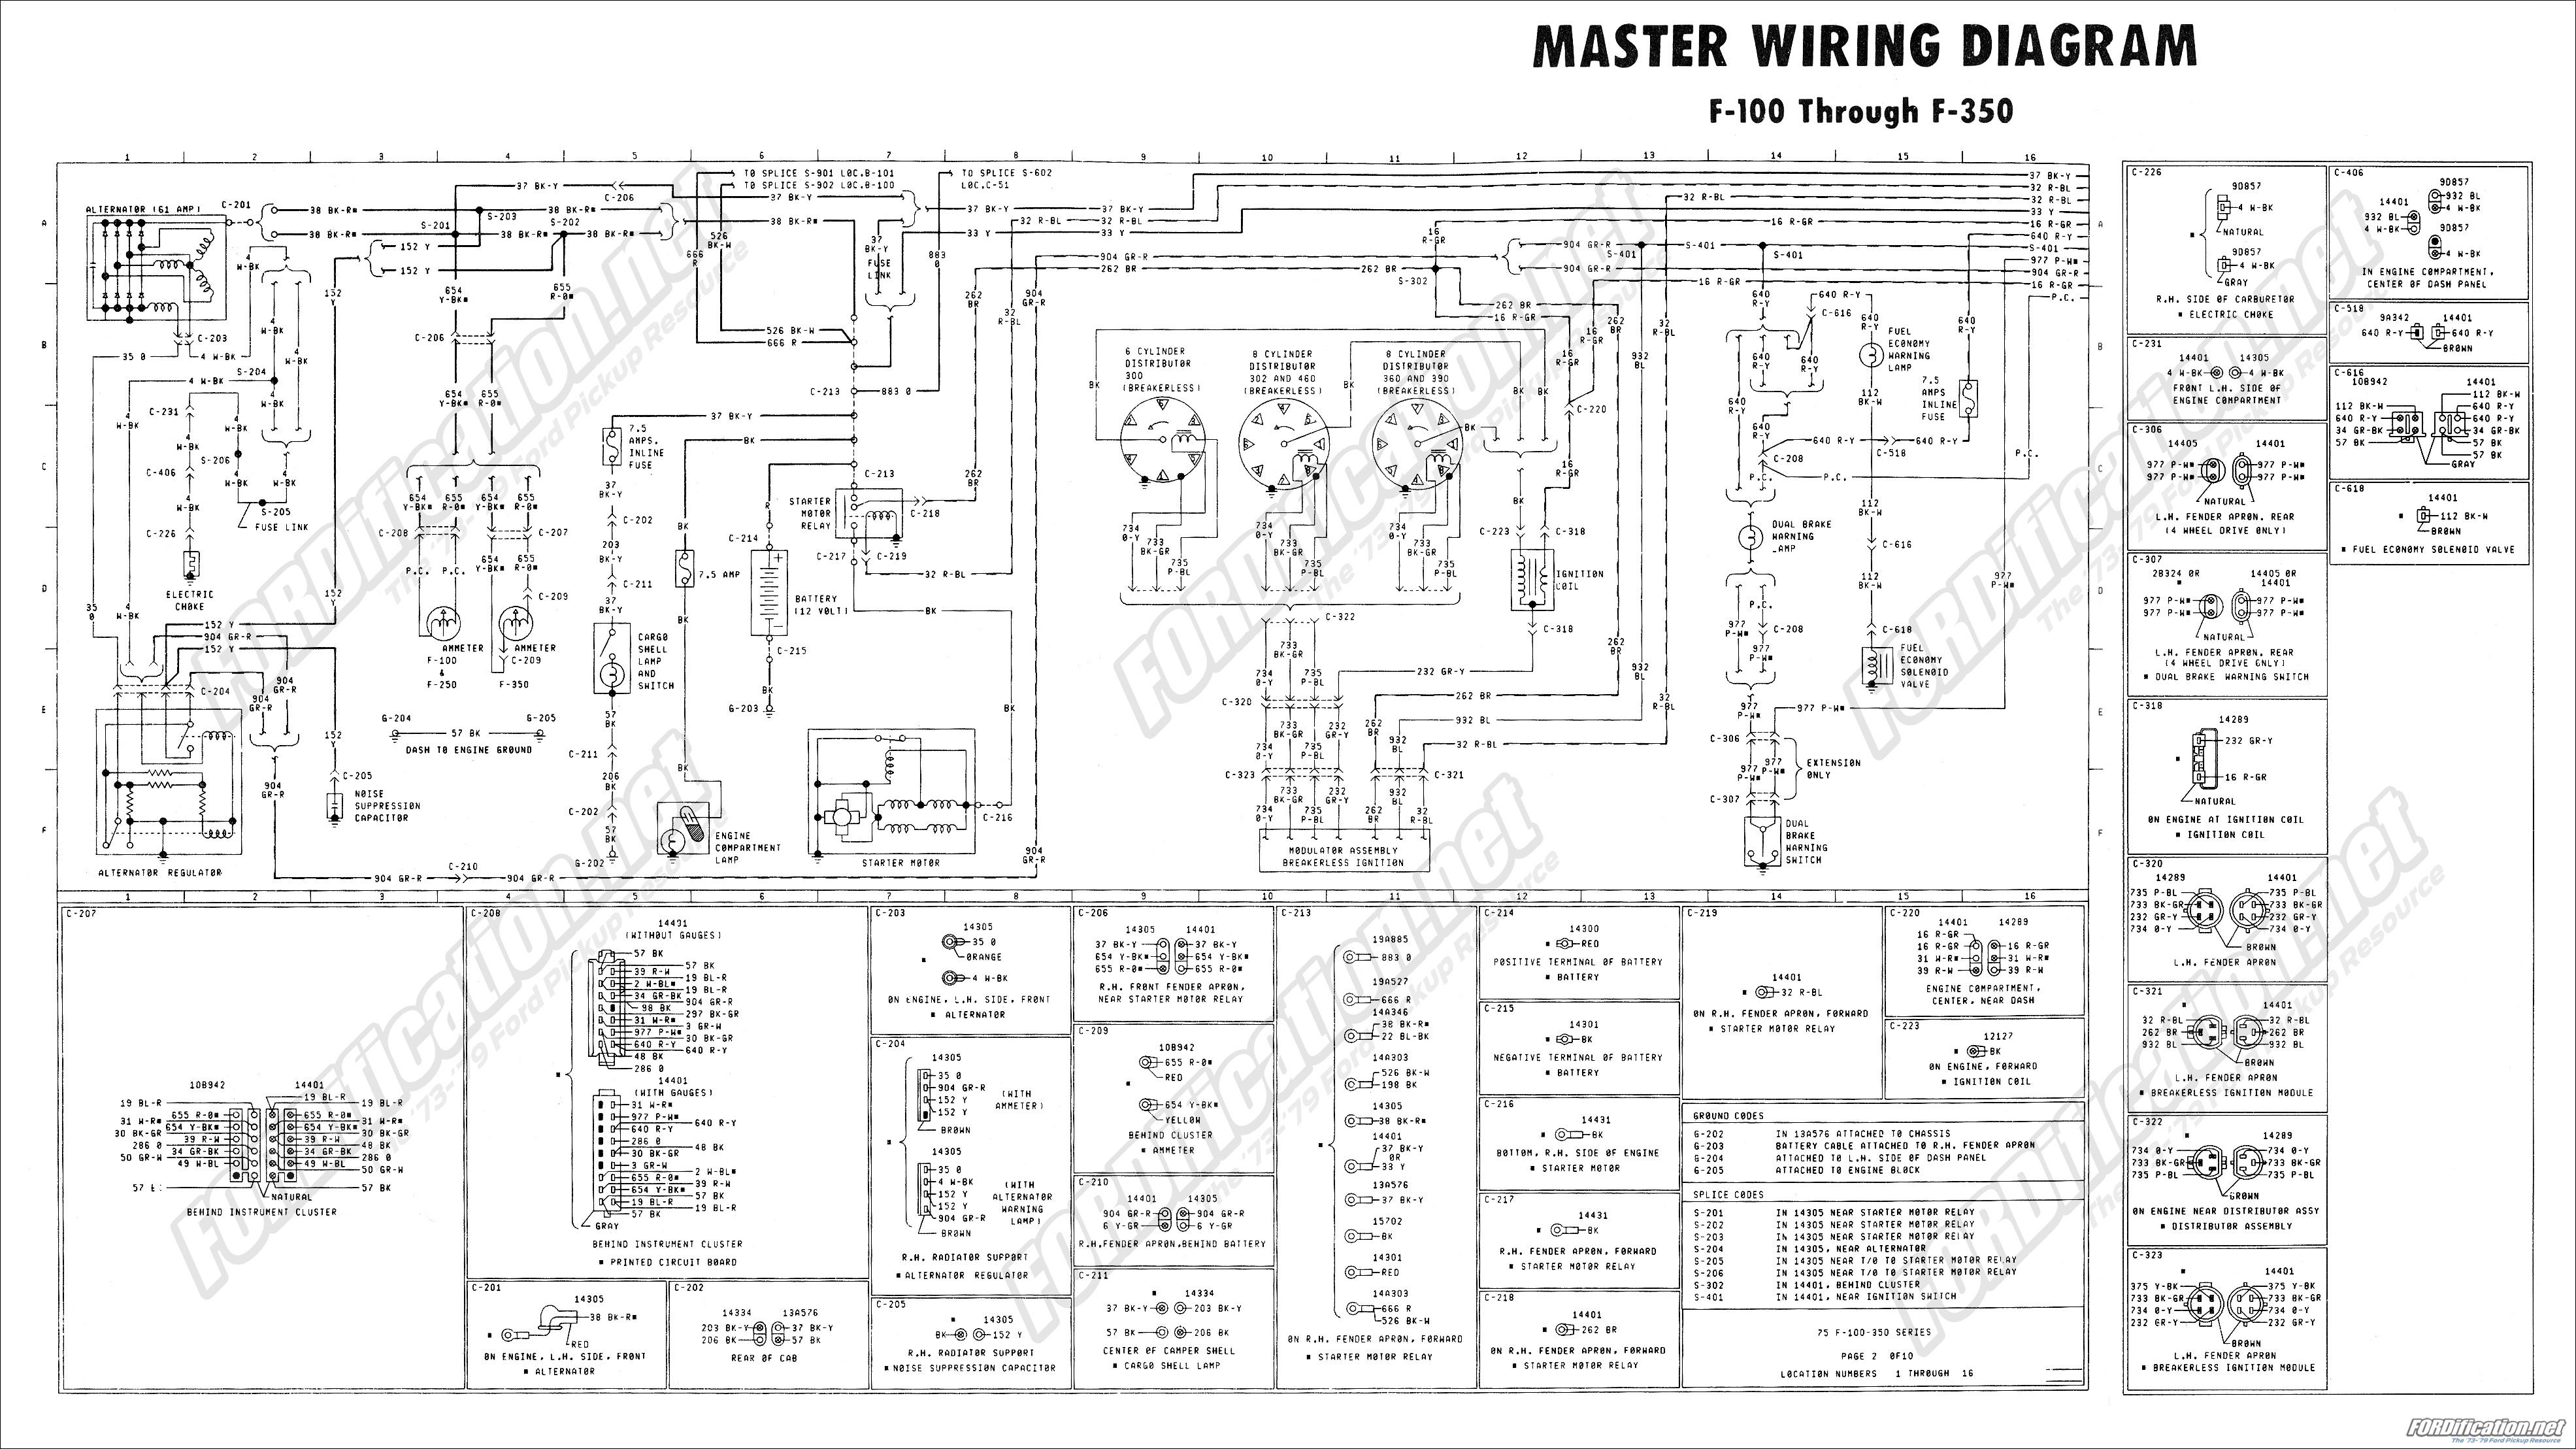 Alternator For 1999 F150 Wiring Diagram. wiring diagram